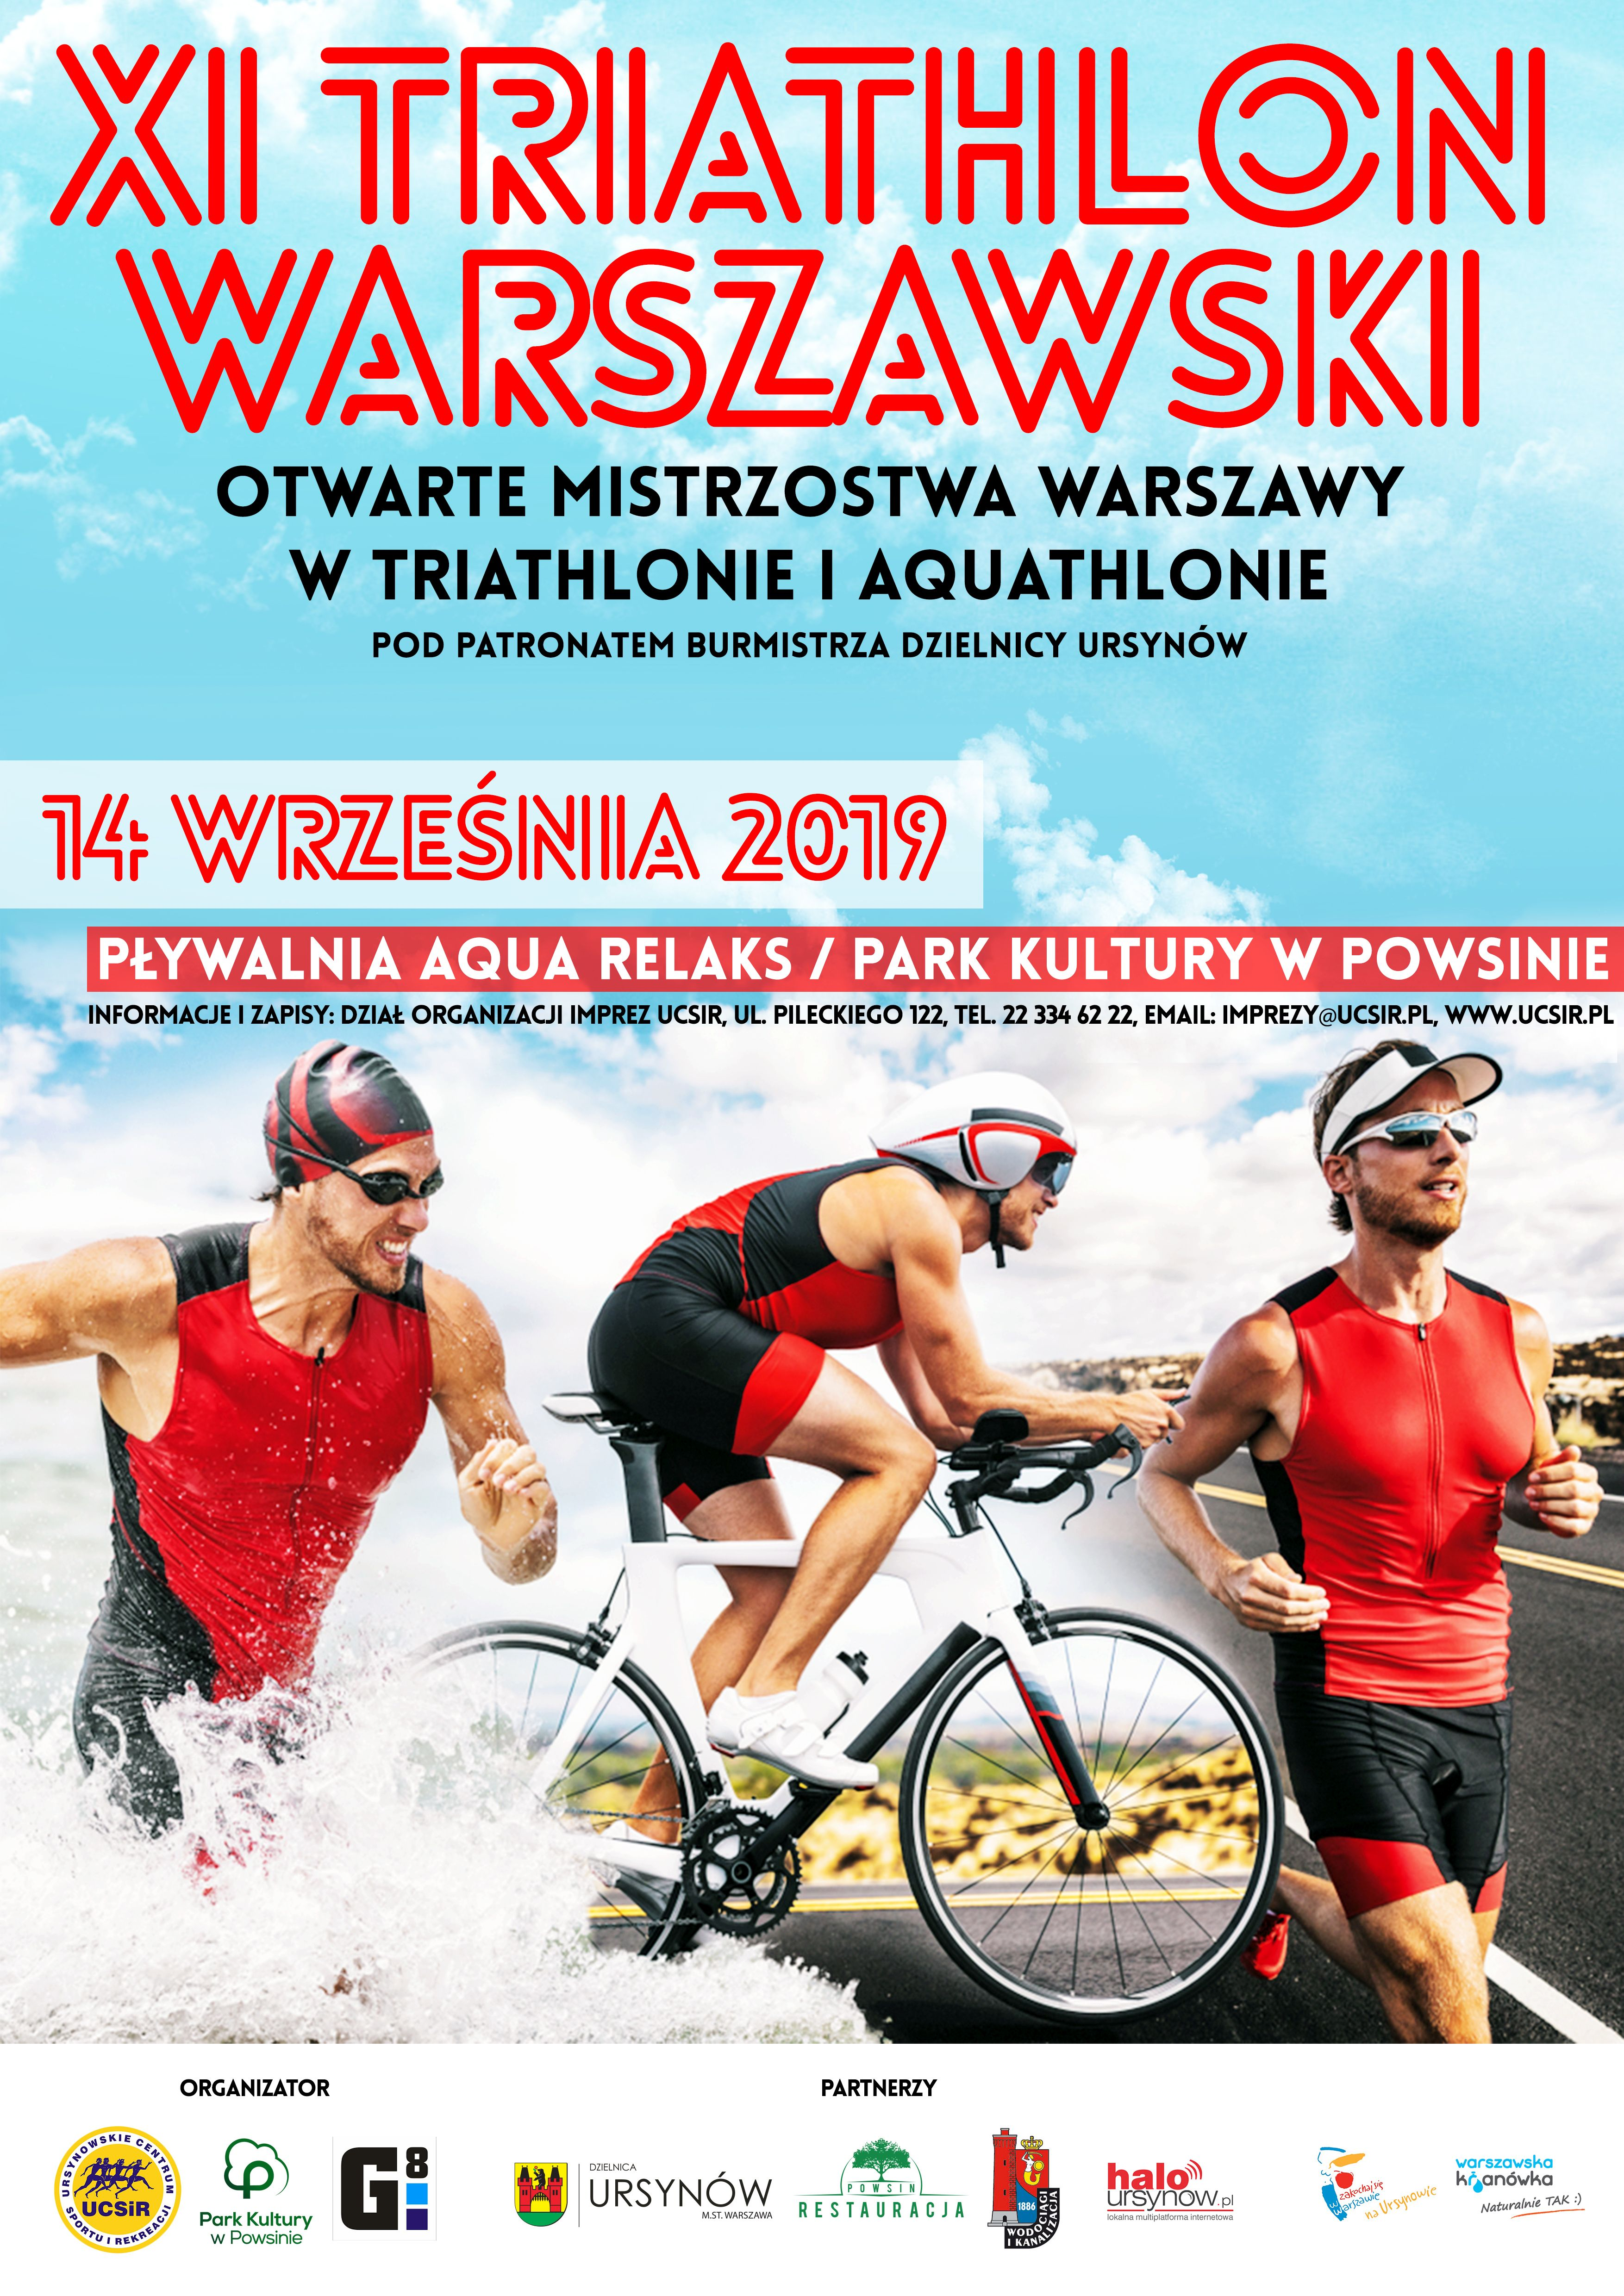 plakat 11 triathlon warszawski